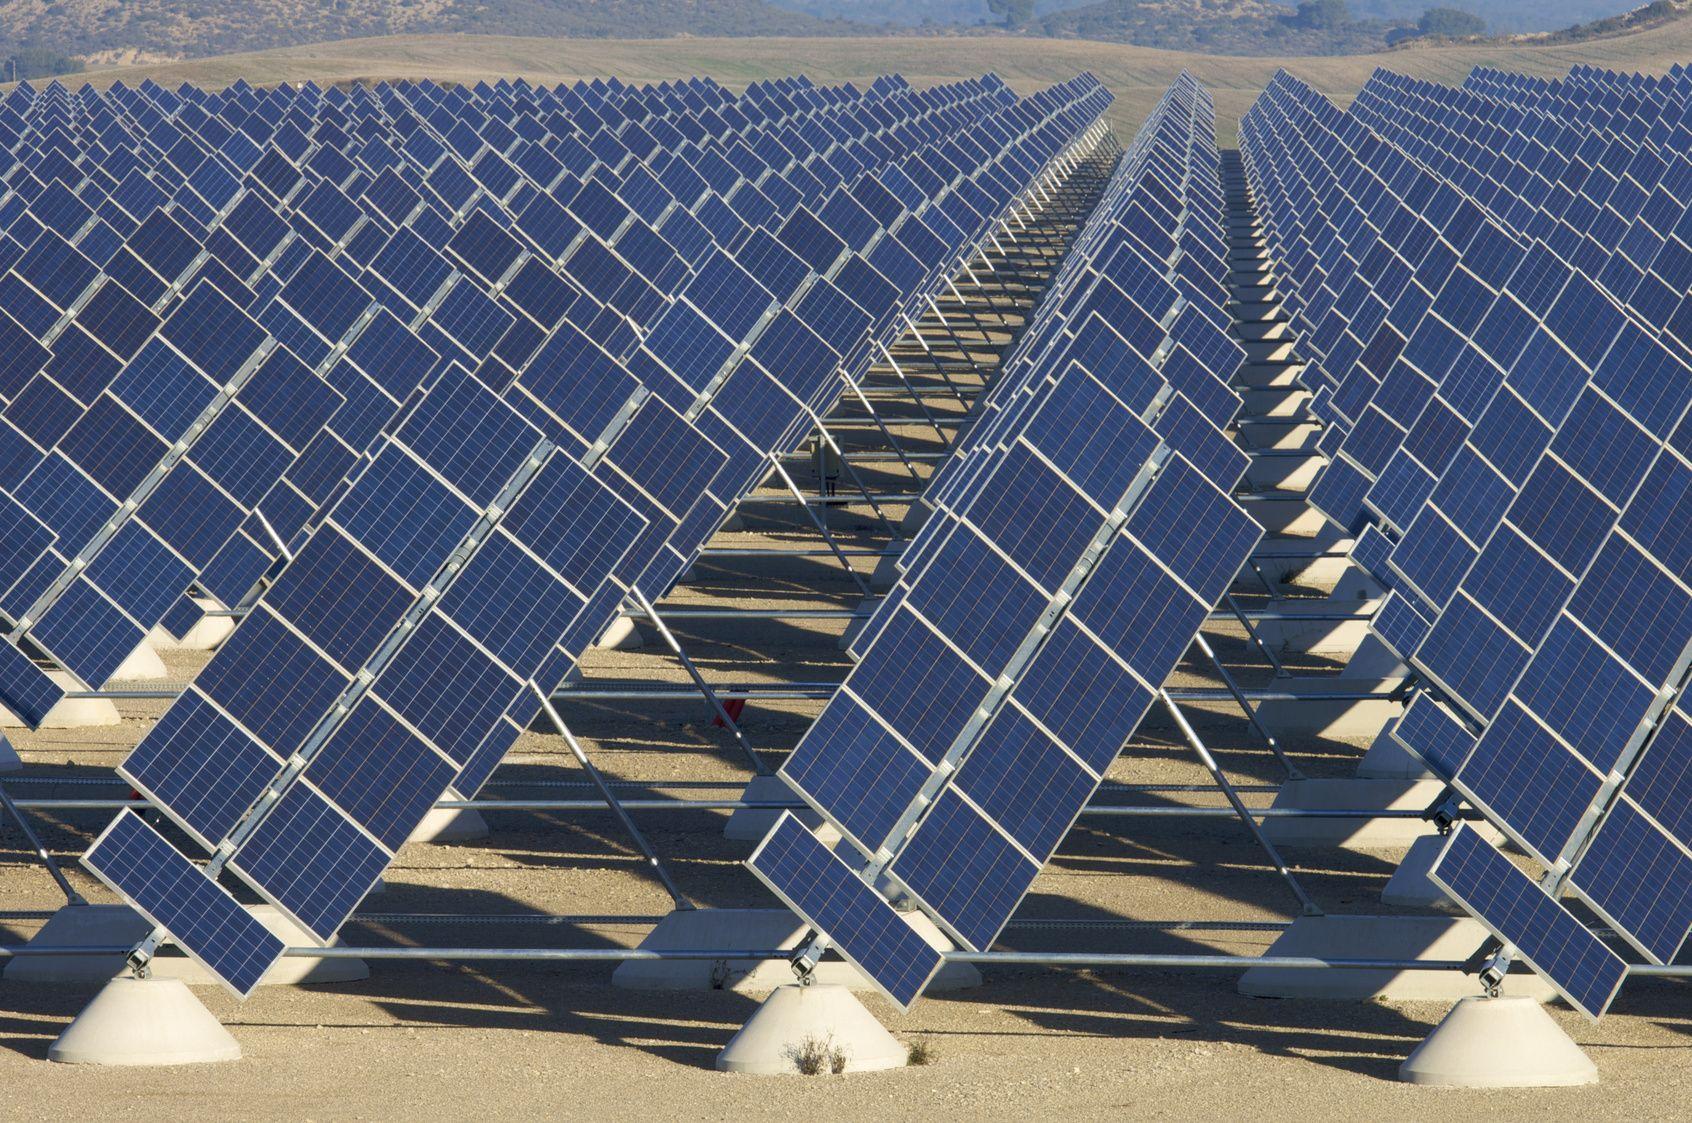 Sunedison To Construct Three New Solar Power Plants In Utah Totaling 262 Mw Solar Farm Solar Solar Power Plant